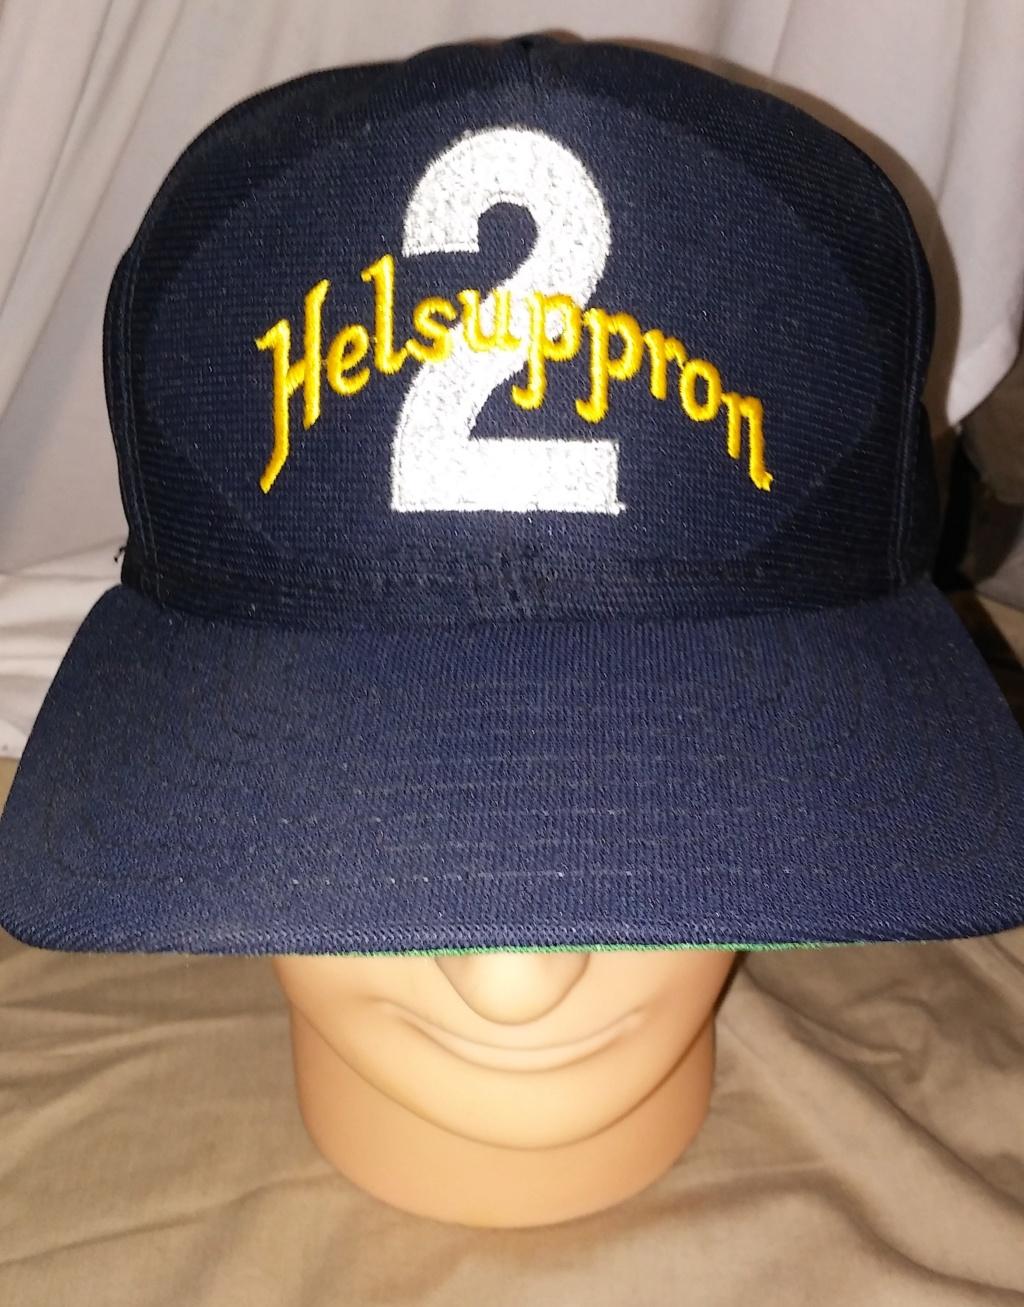 USN Blue Caps Helsup10